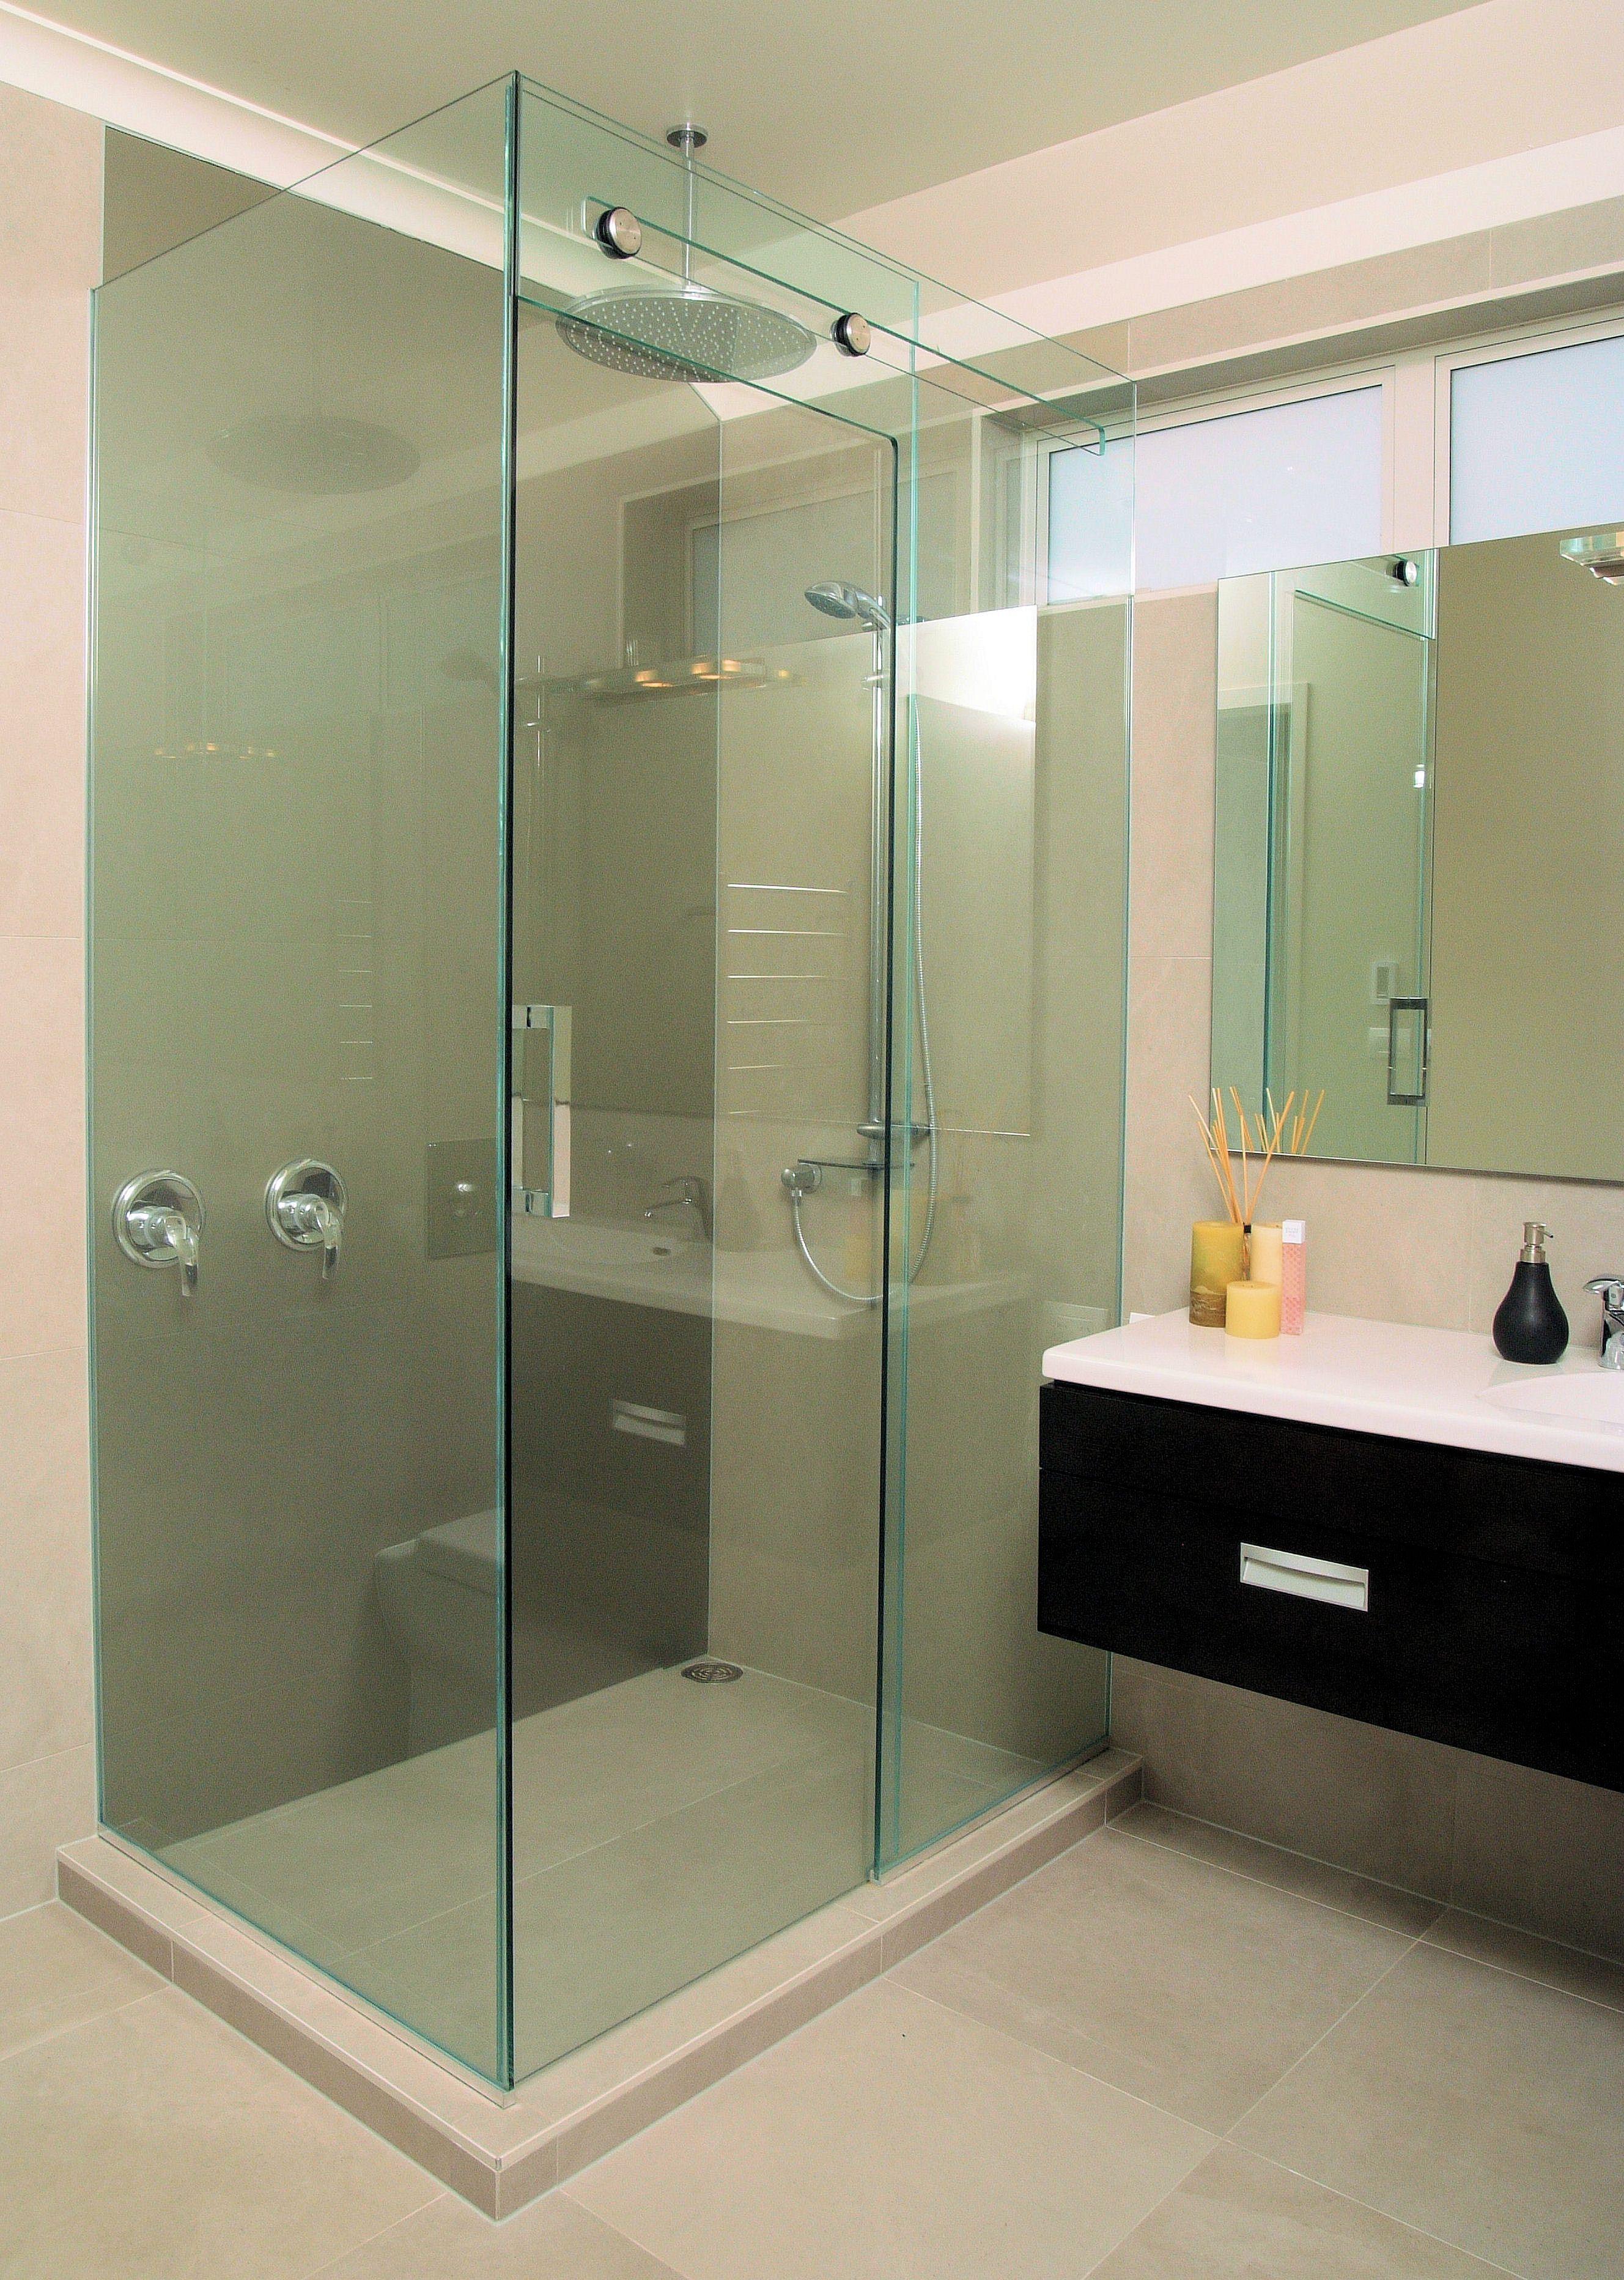 Verotti Bathroom Culture Sliding Door Shower Bathroom Design